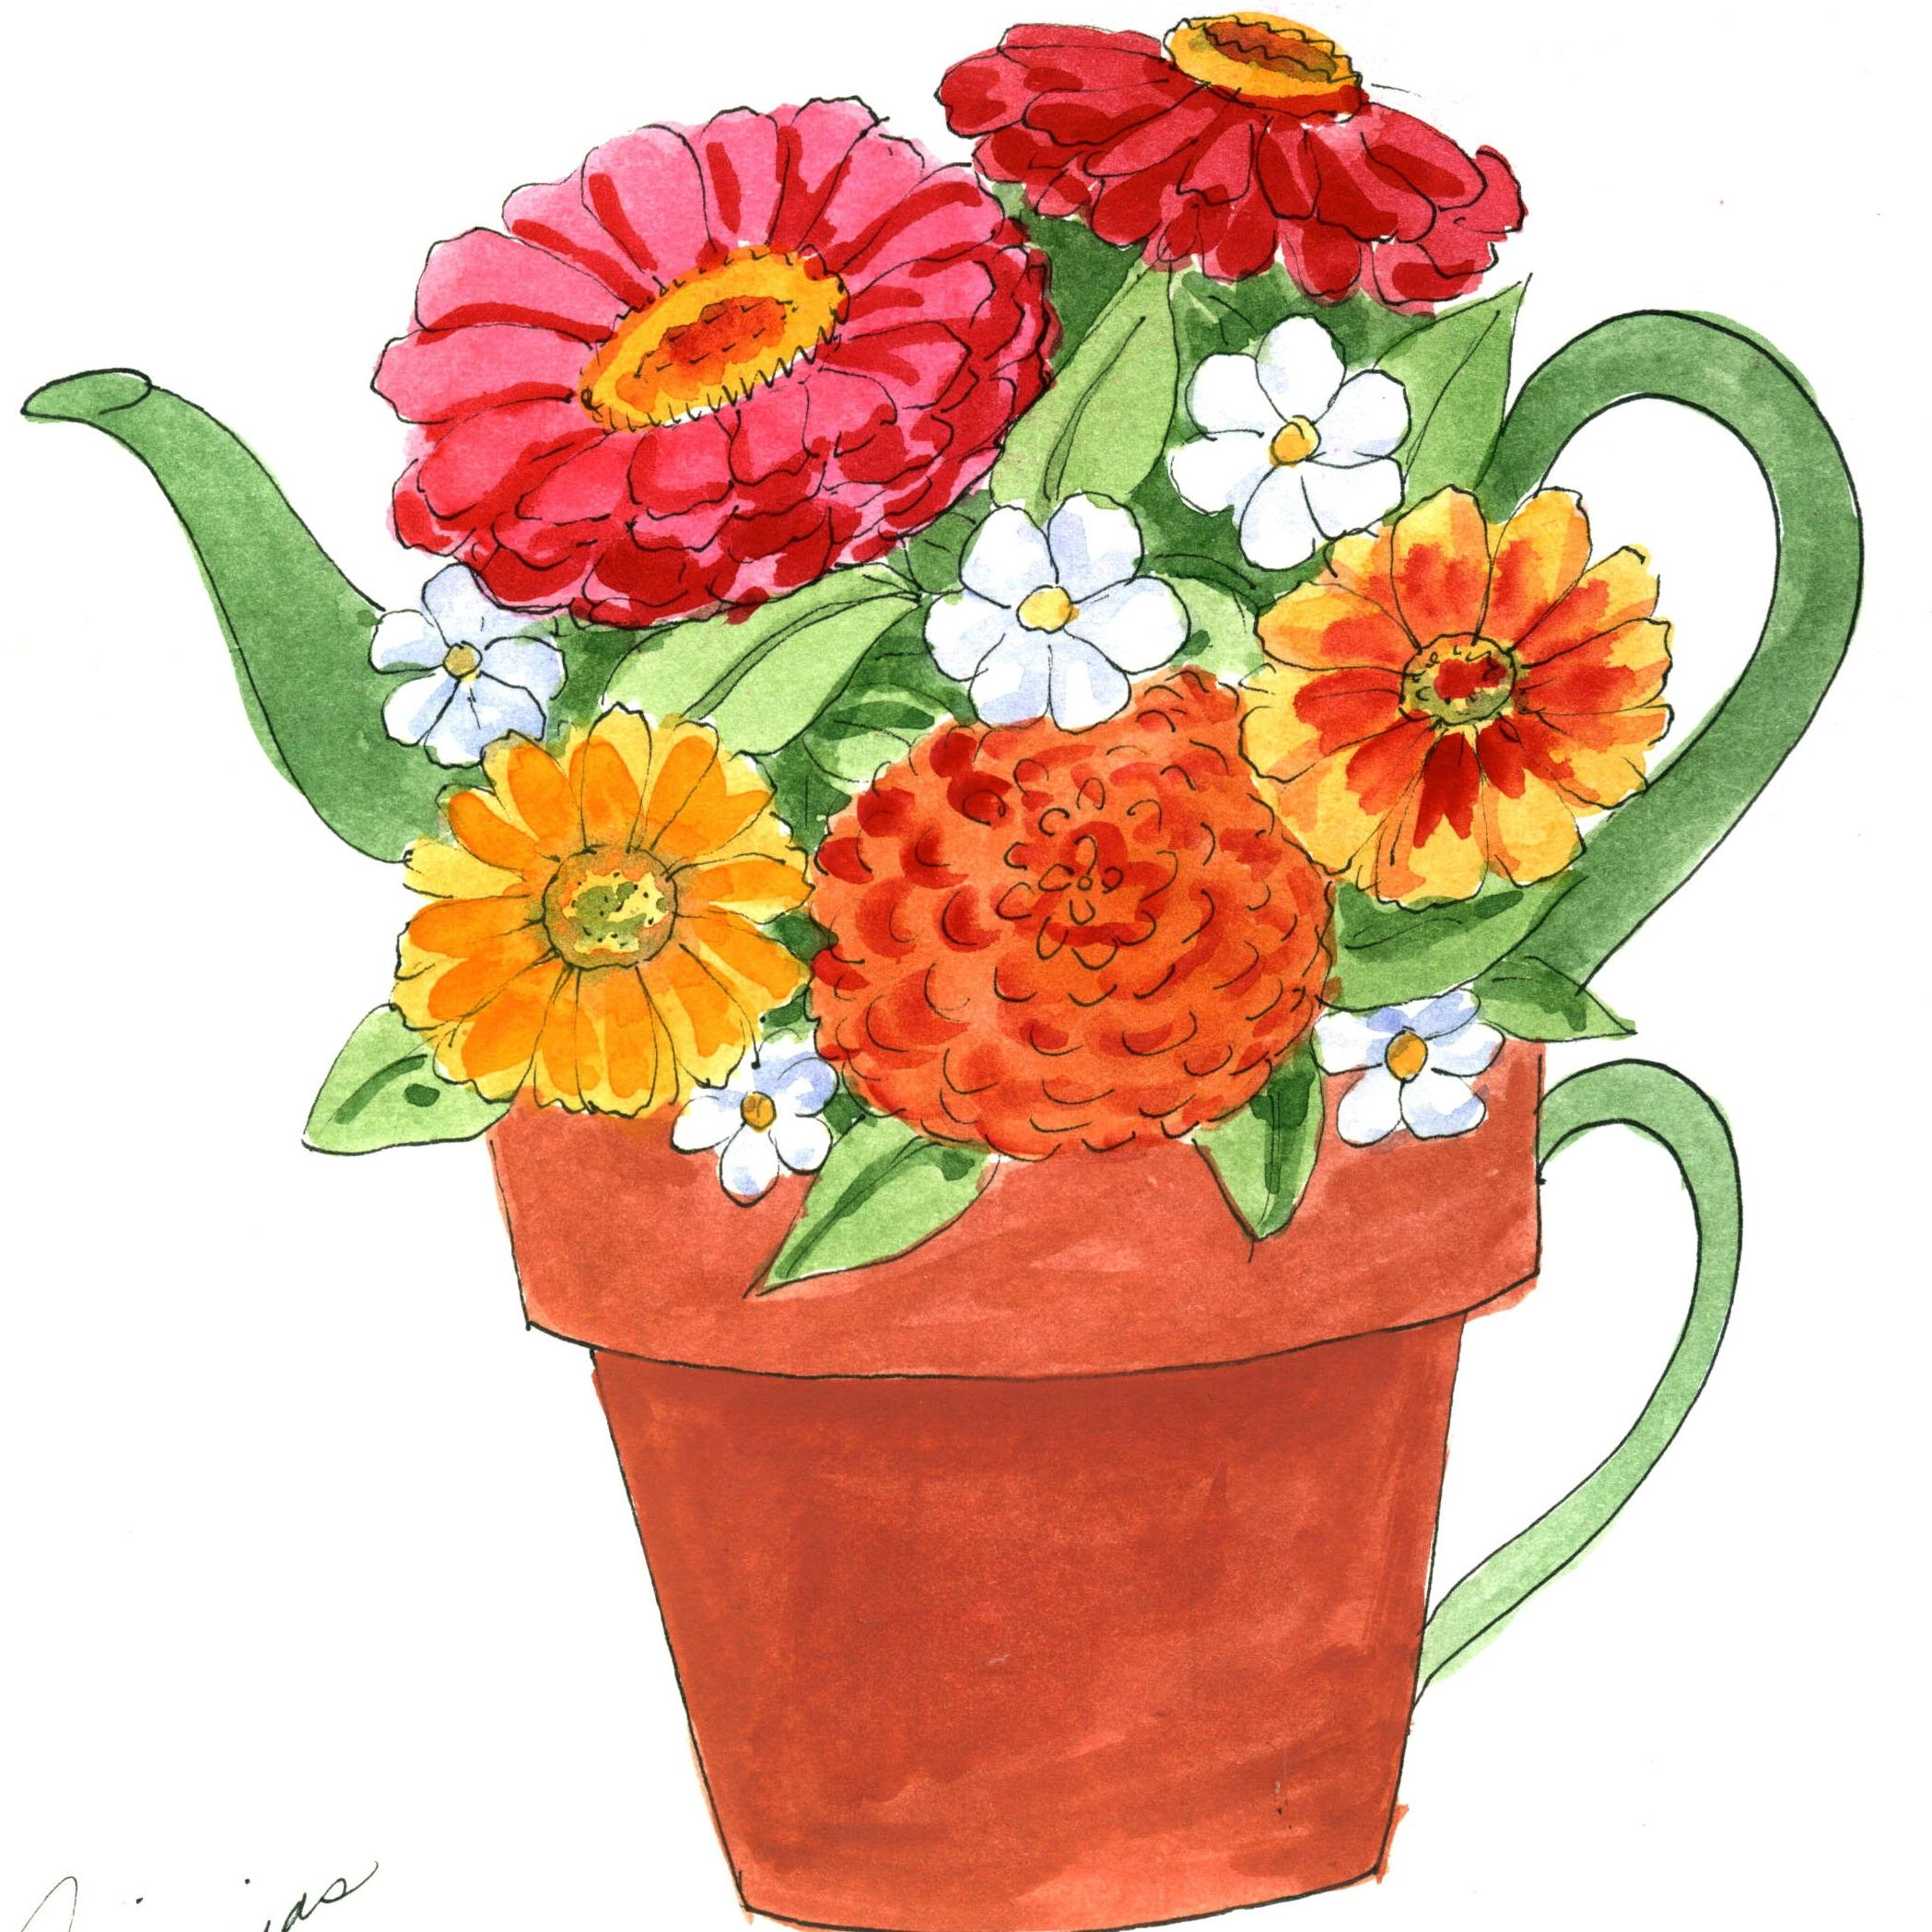 Tea for One Zinnia Flower Pot of Tea